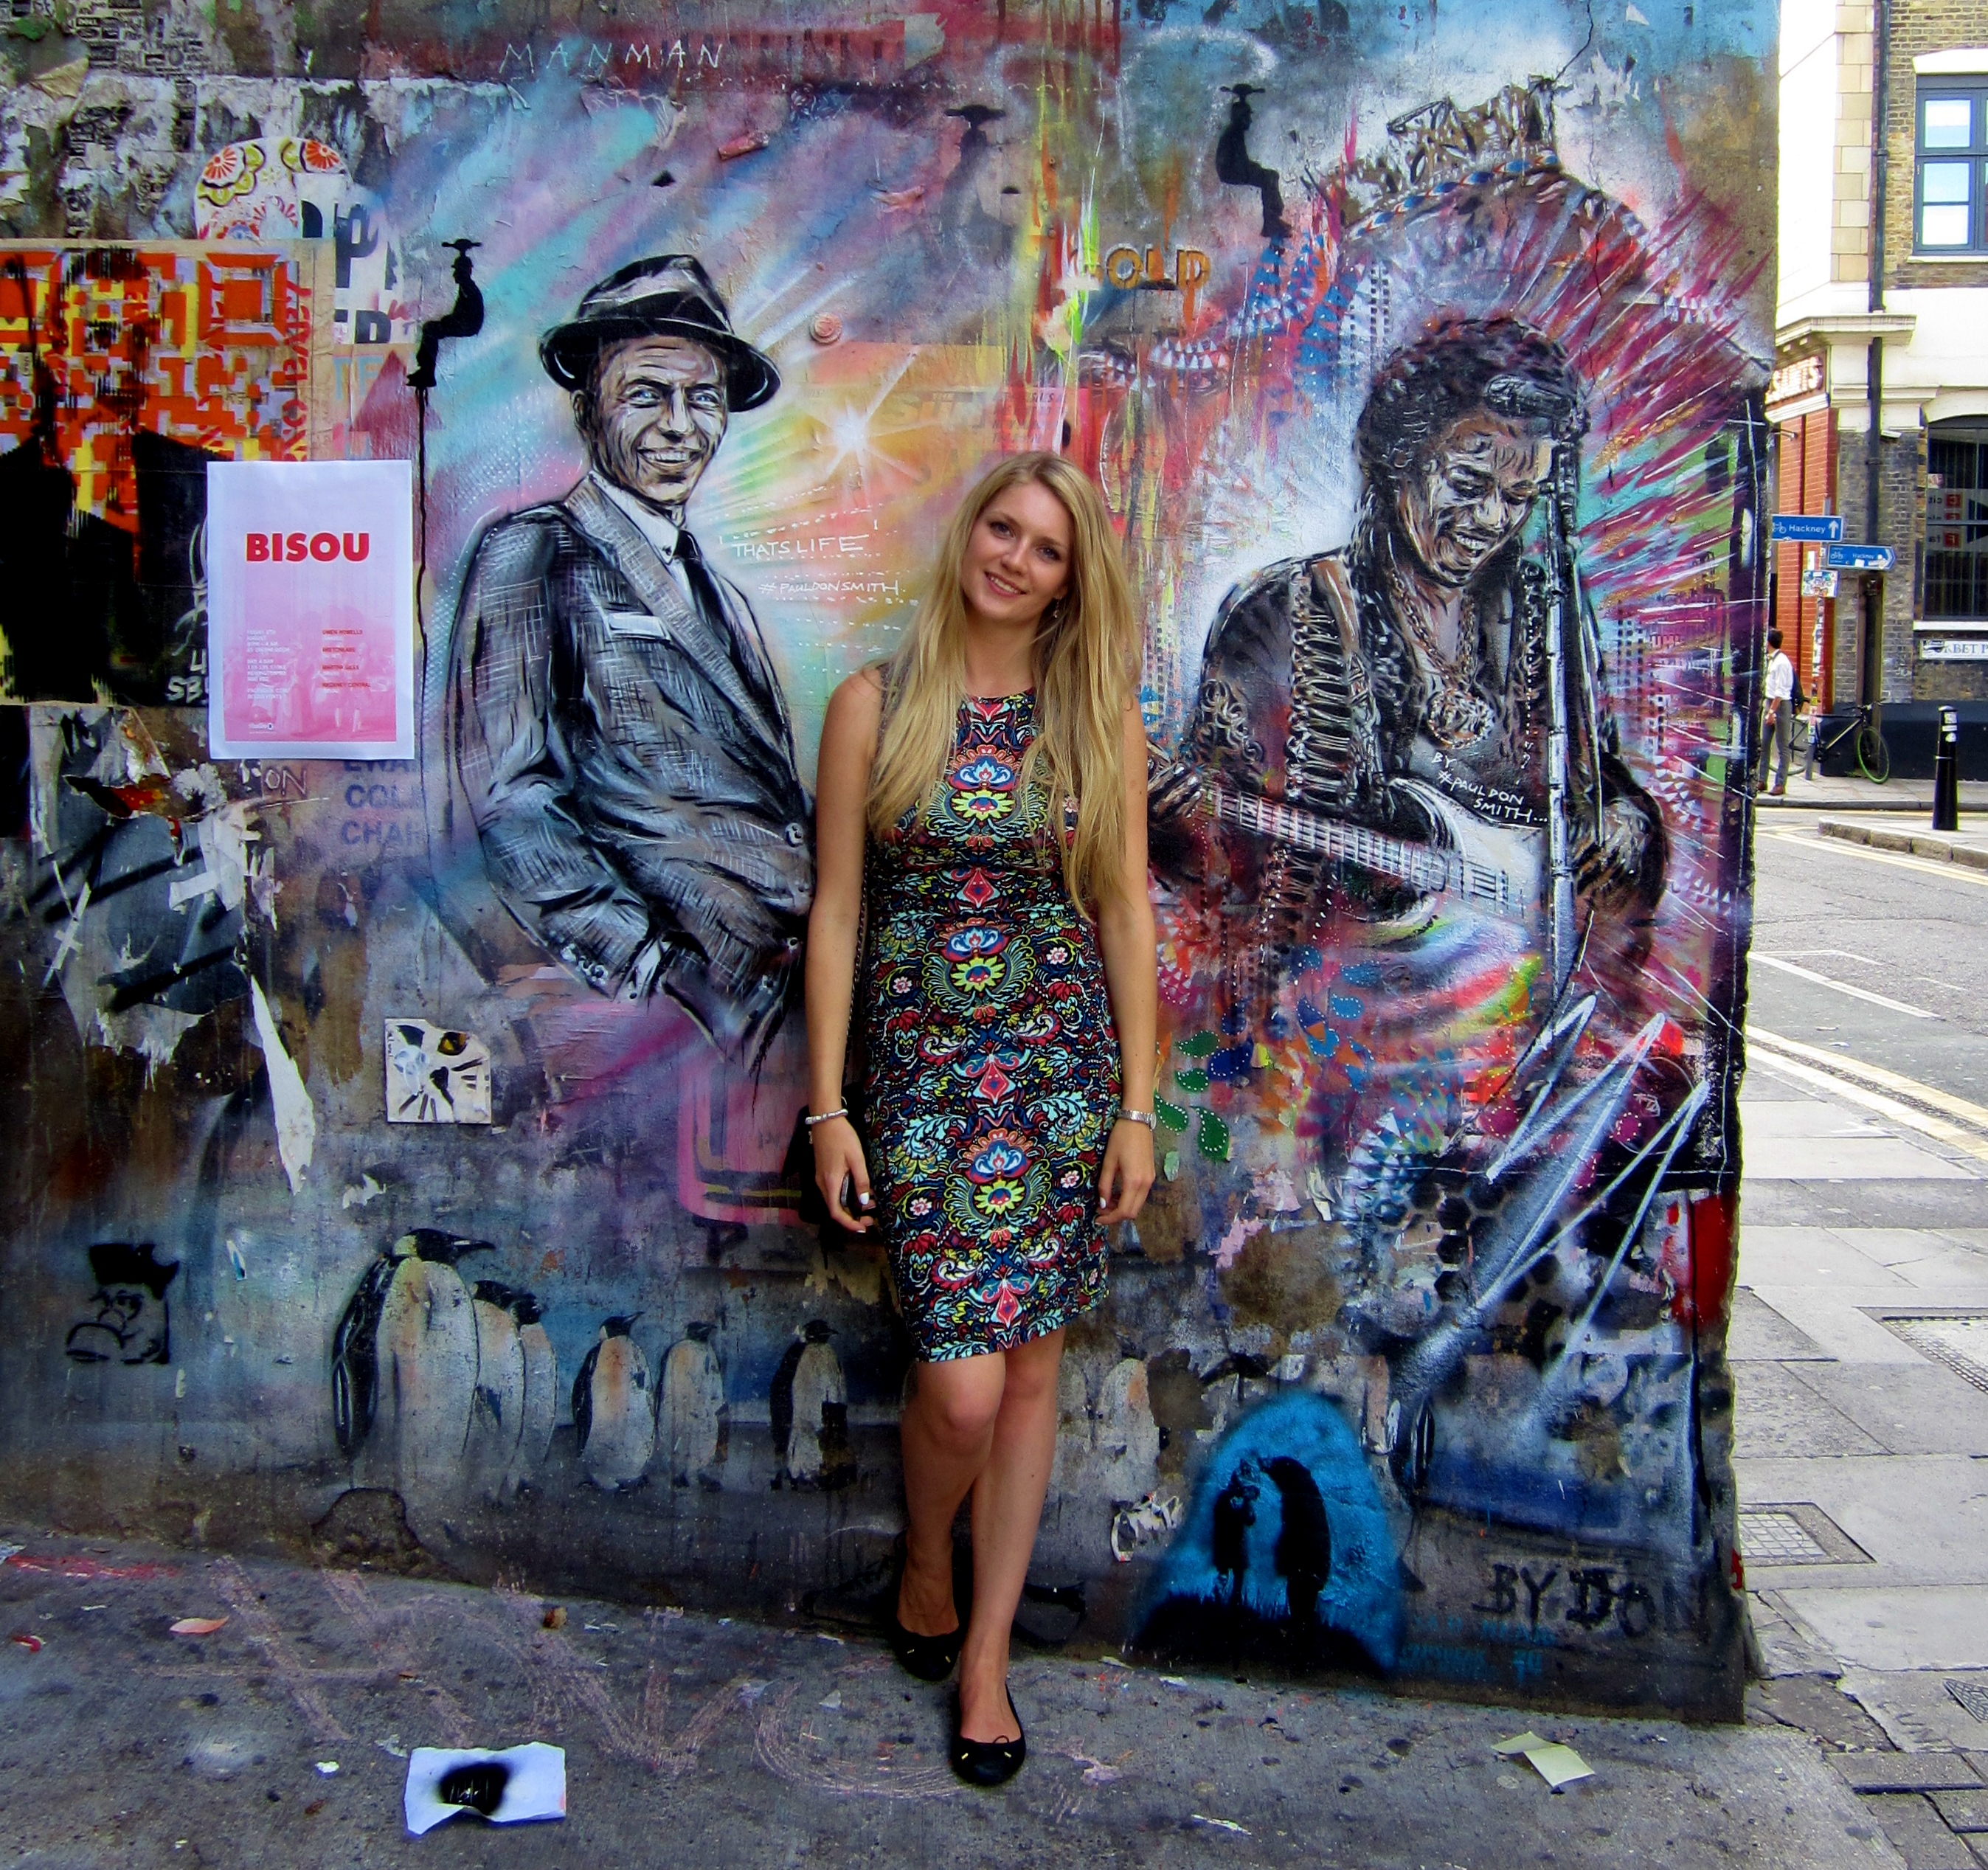 Street Art Walking Tour Around East London The Well